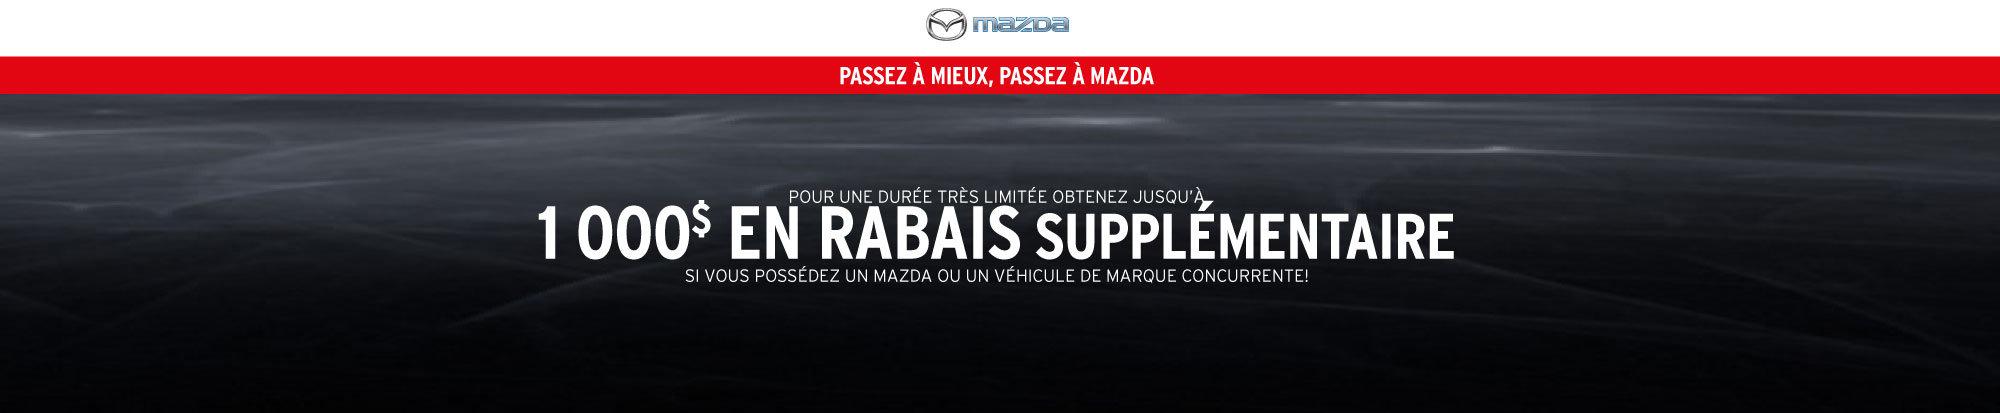 Passez à mieux... Passez à Mazda